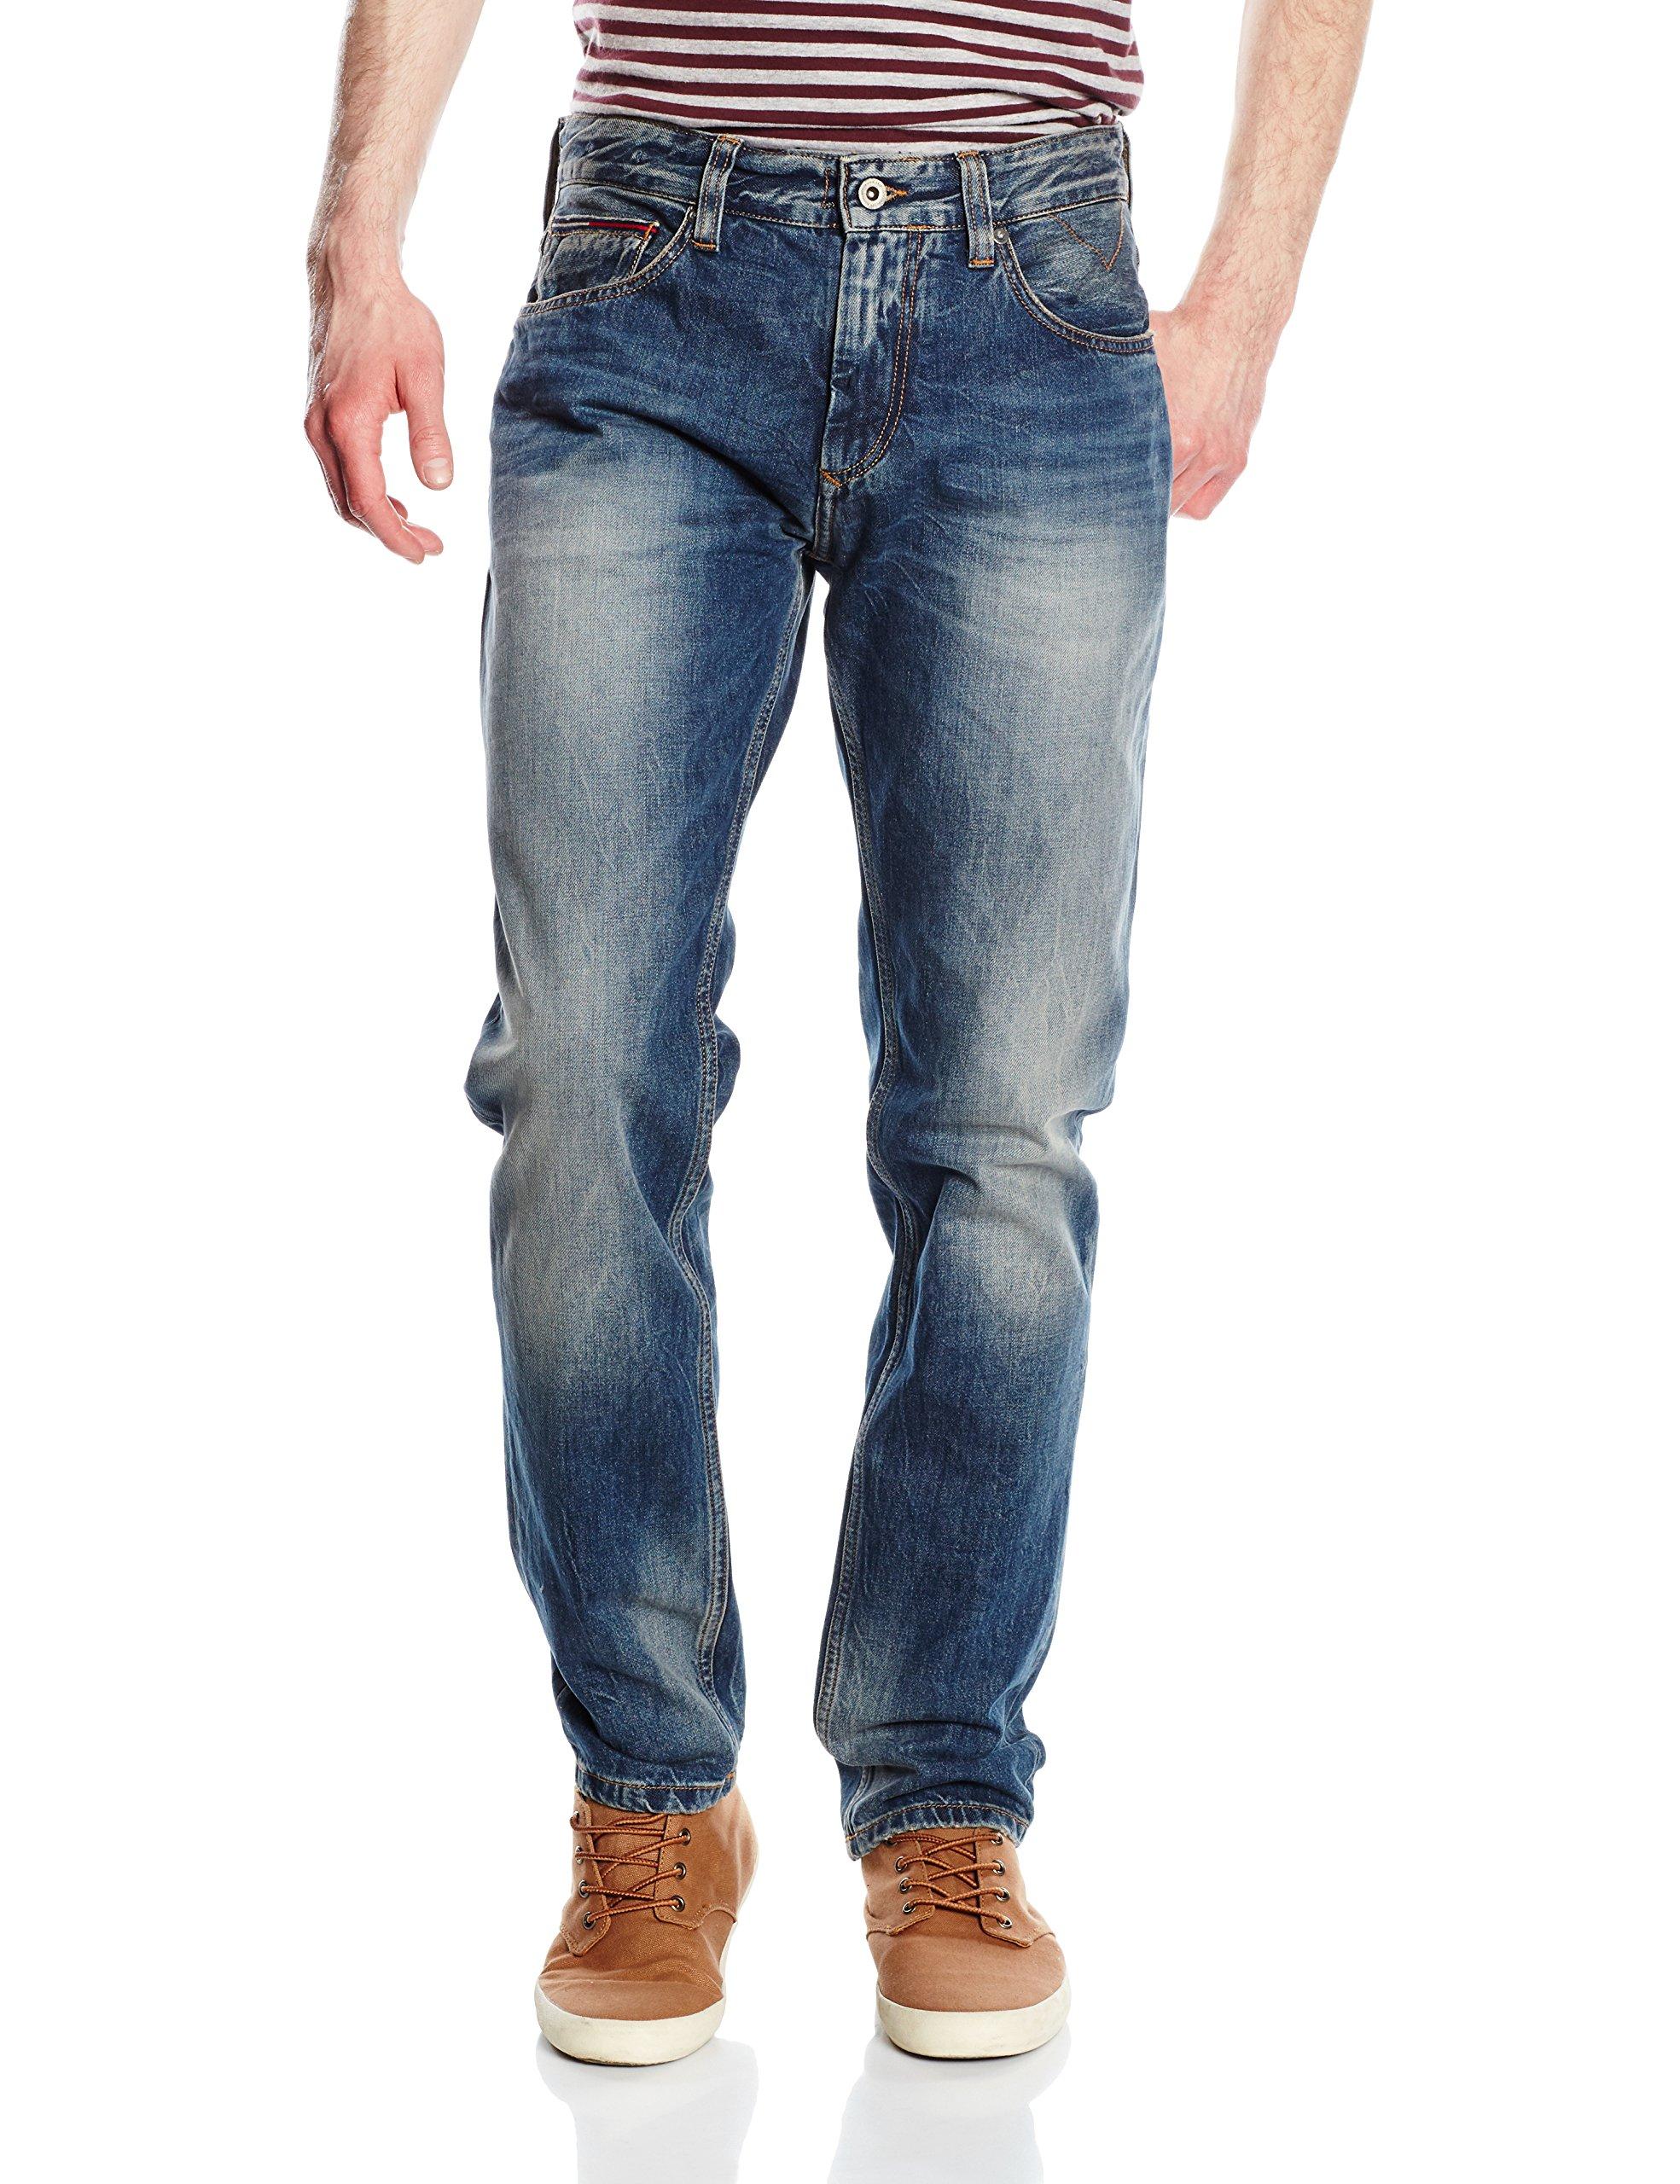 PebJean penrose l34 Denim Jeans Hilfiger Tapered Tommy Original Ronnie BlueW28 HommeBleu v8nm0NwO